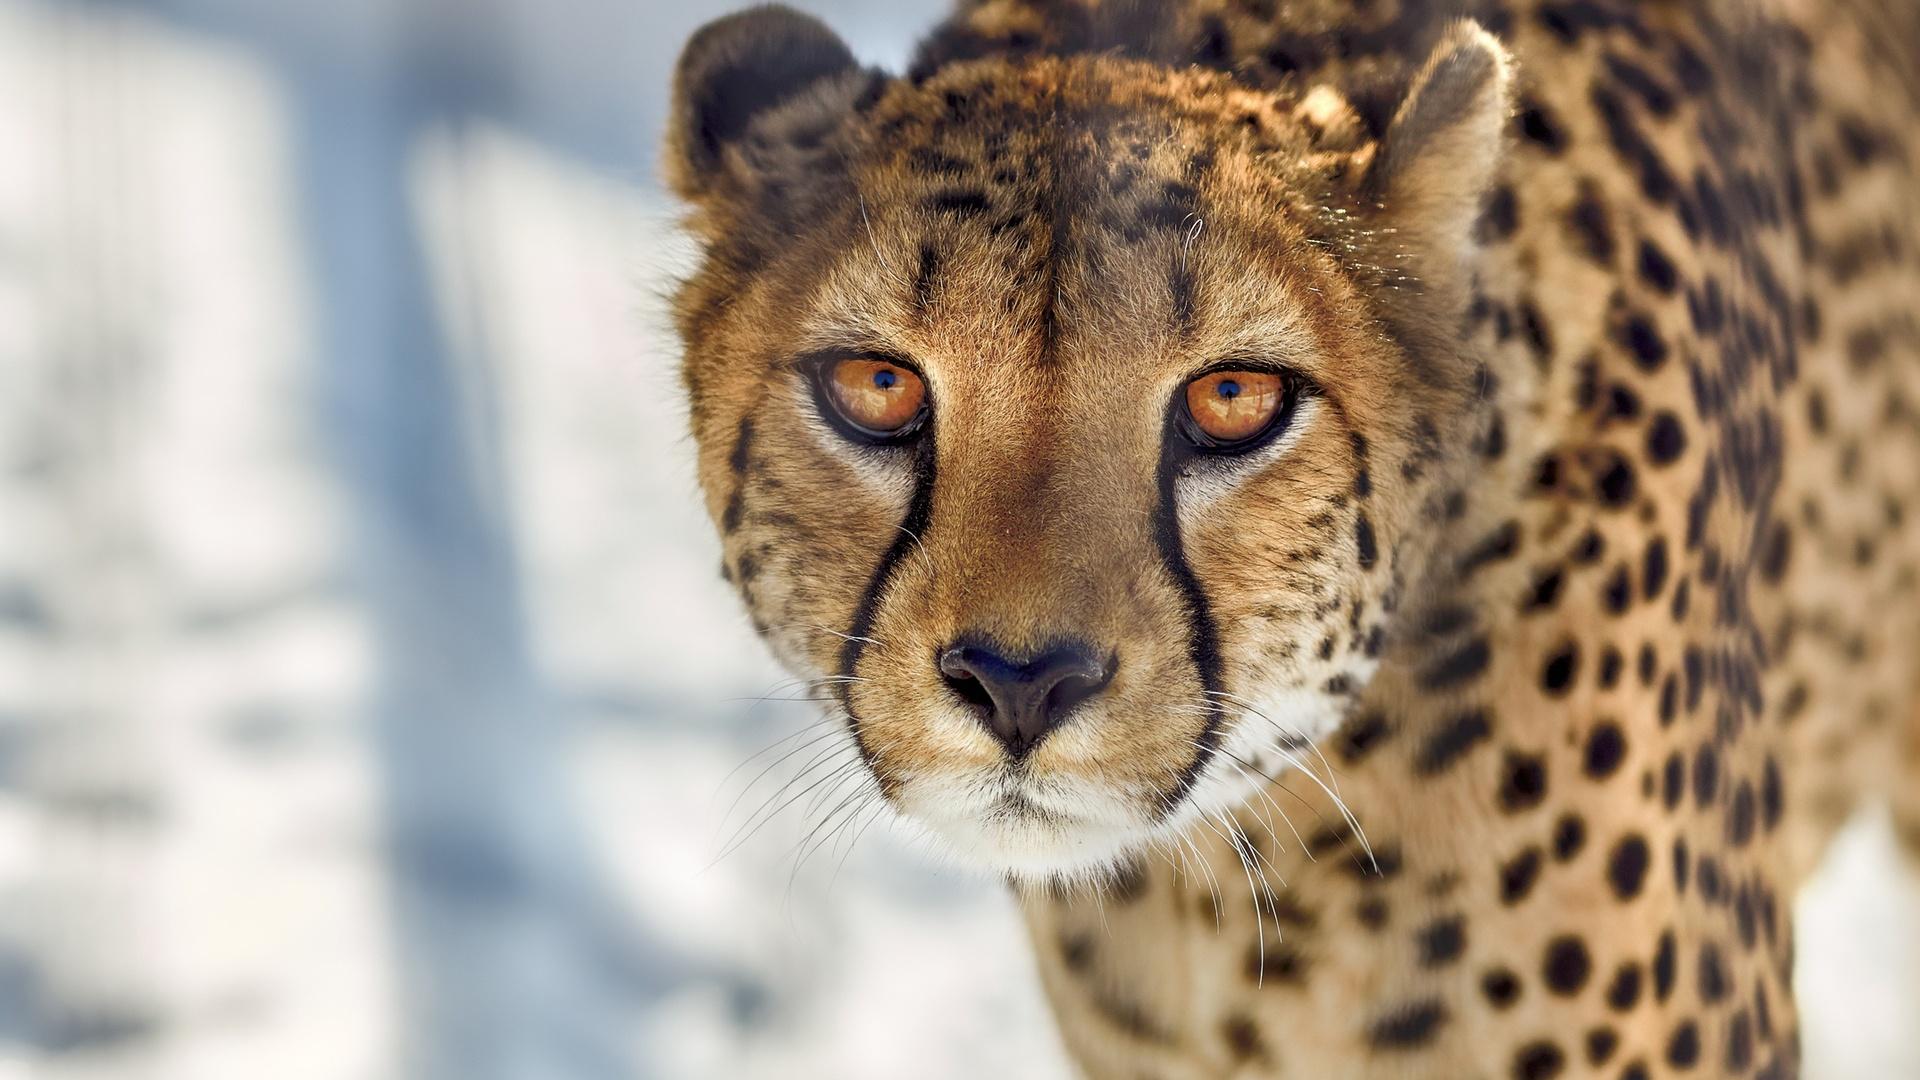 Wallpaper Cheetah Pair Hd Animals 6057: 1920x1080 Cheetah Close Up Laptop Full HD 1080P HD 4k